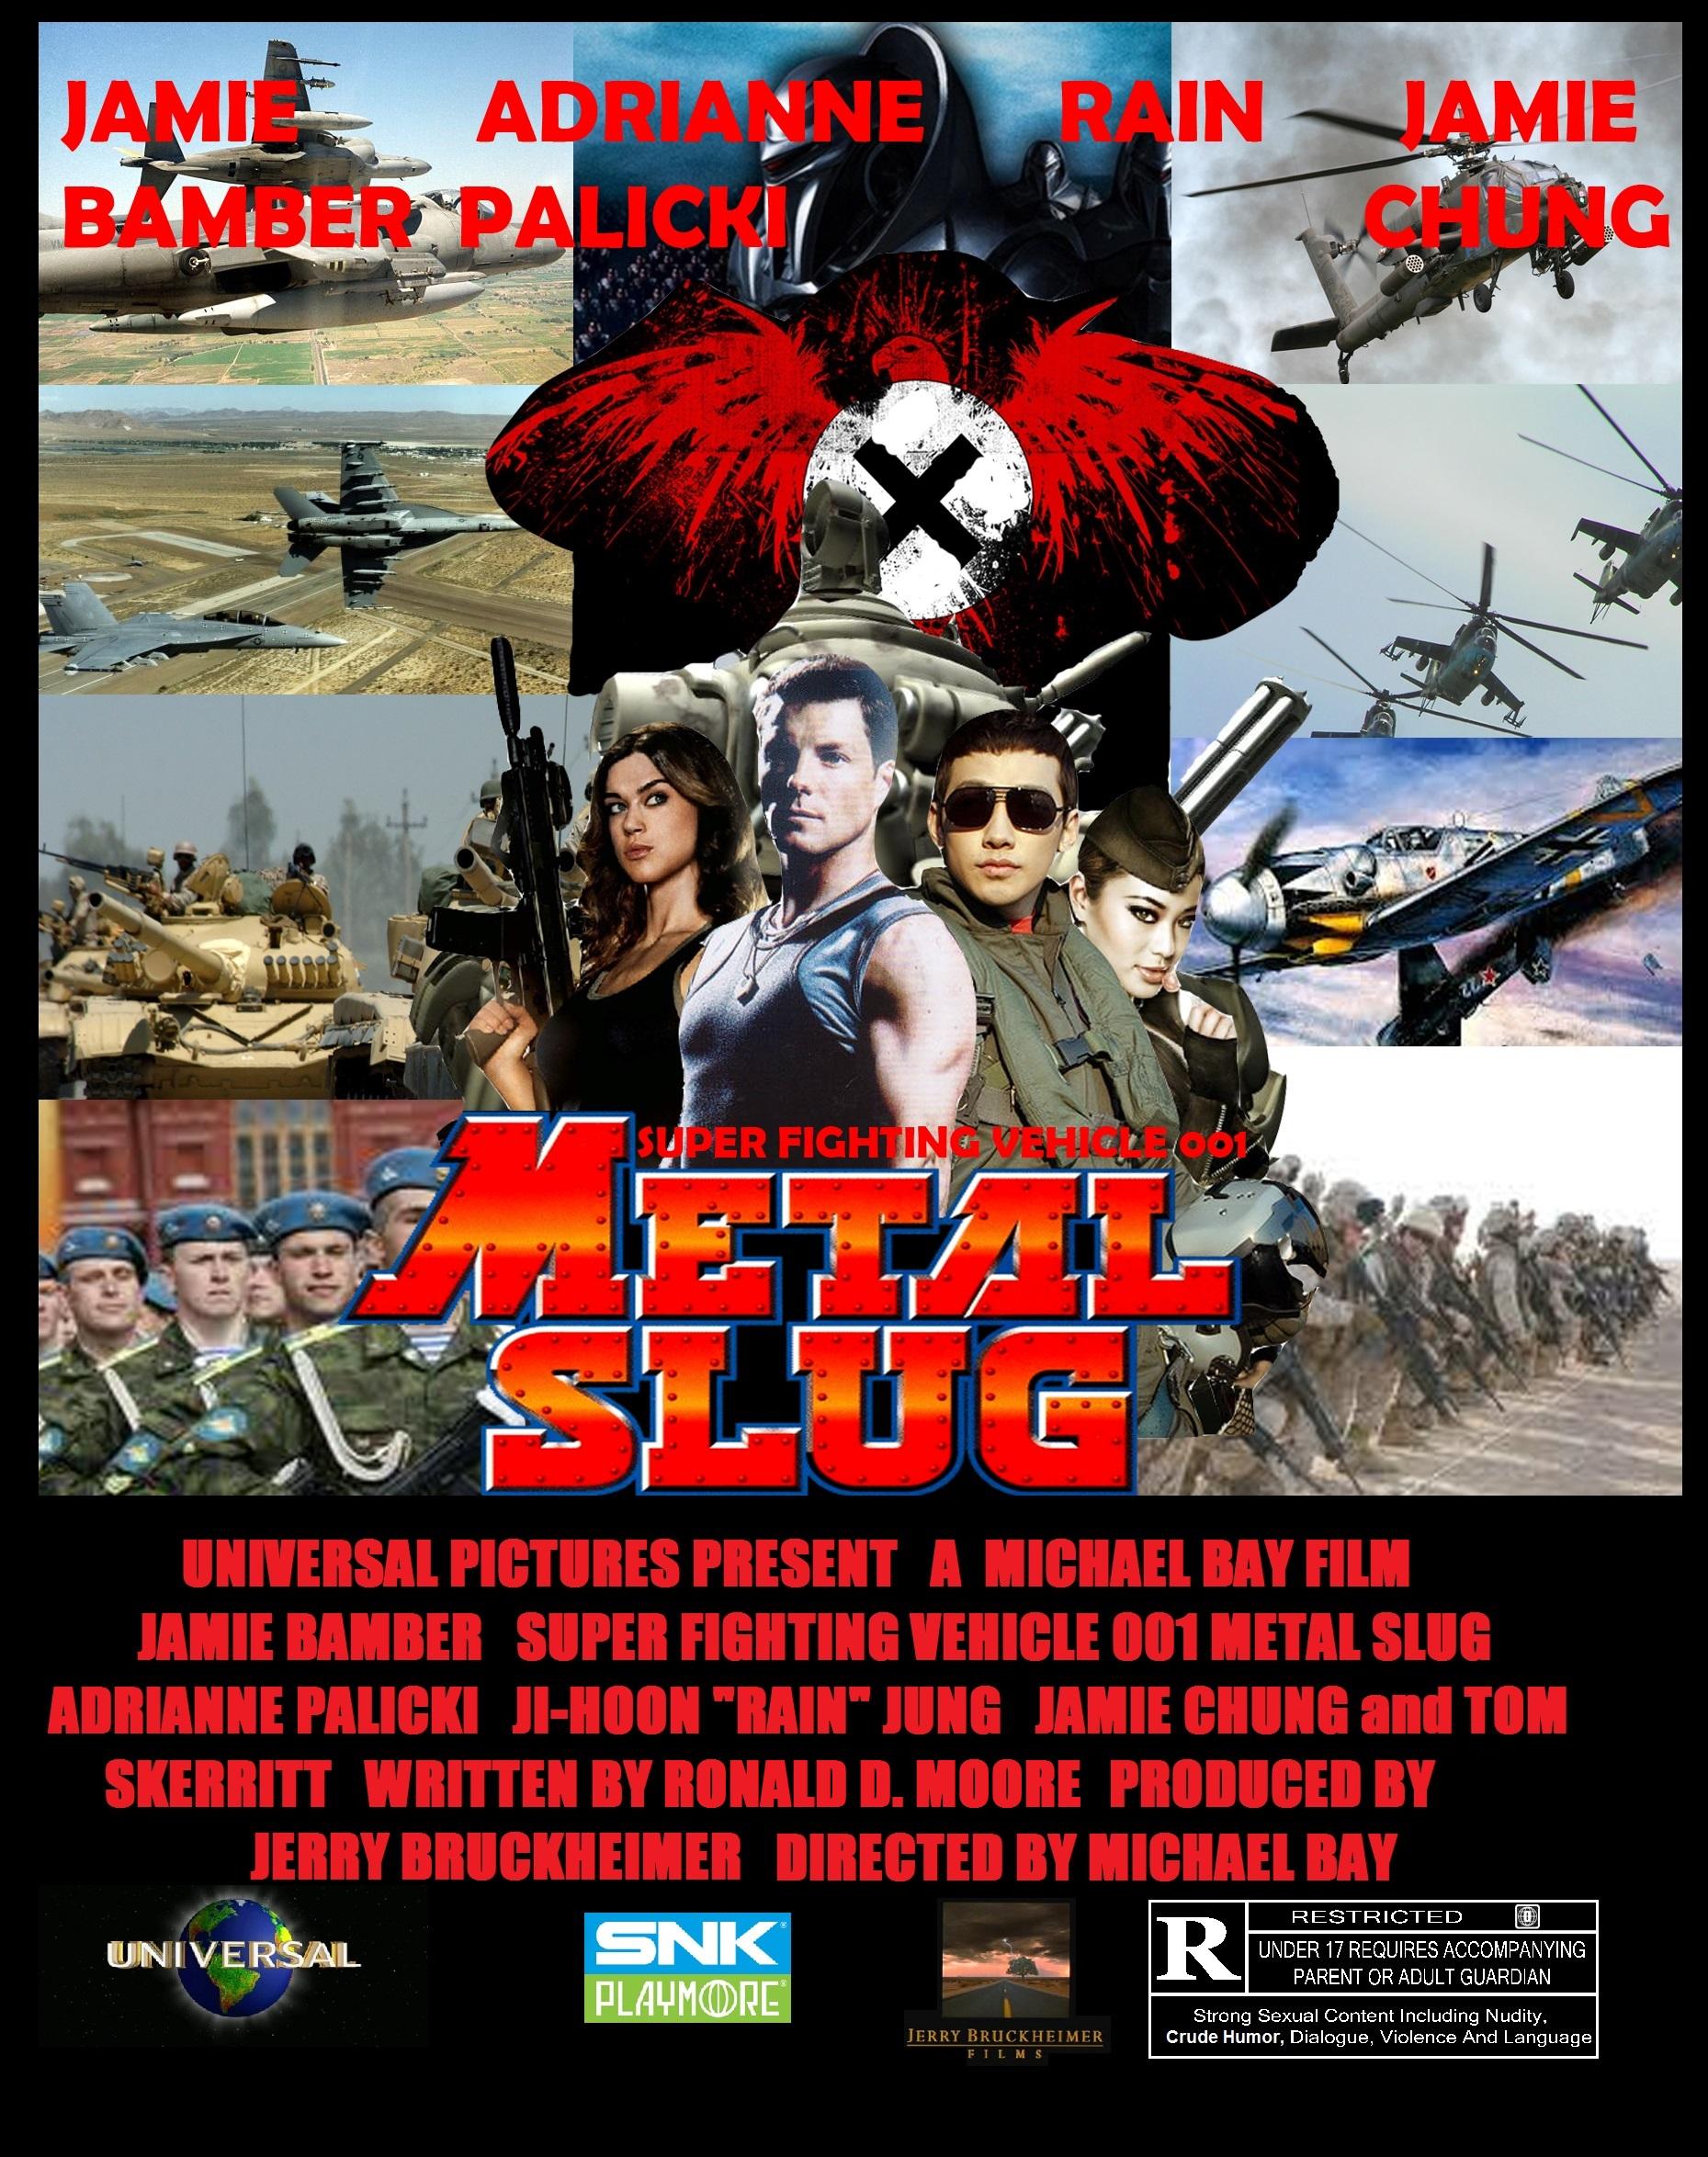 Metal Slug Live Action Movie Poster 1 by BlueWolfRanger95 on